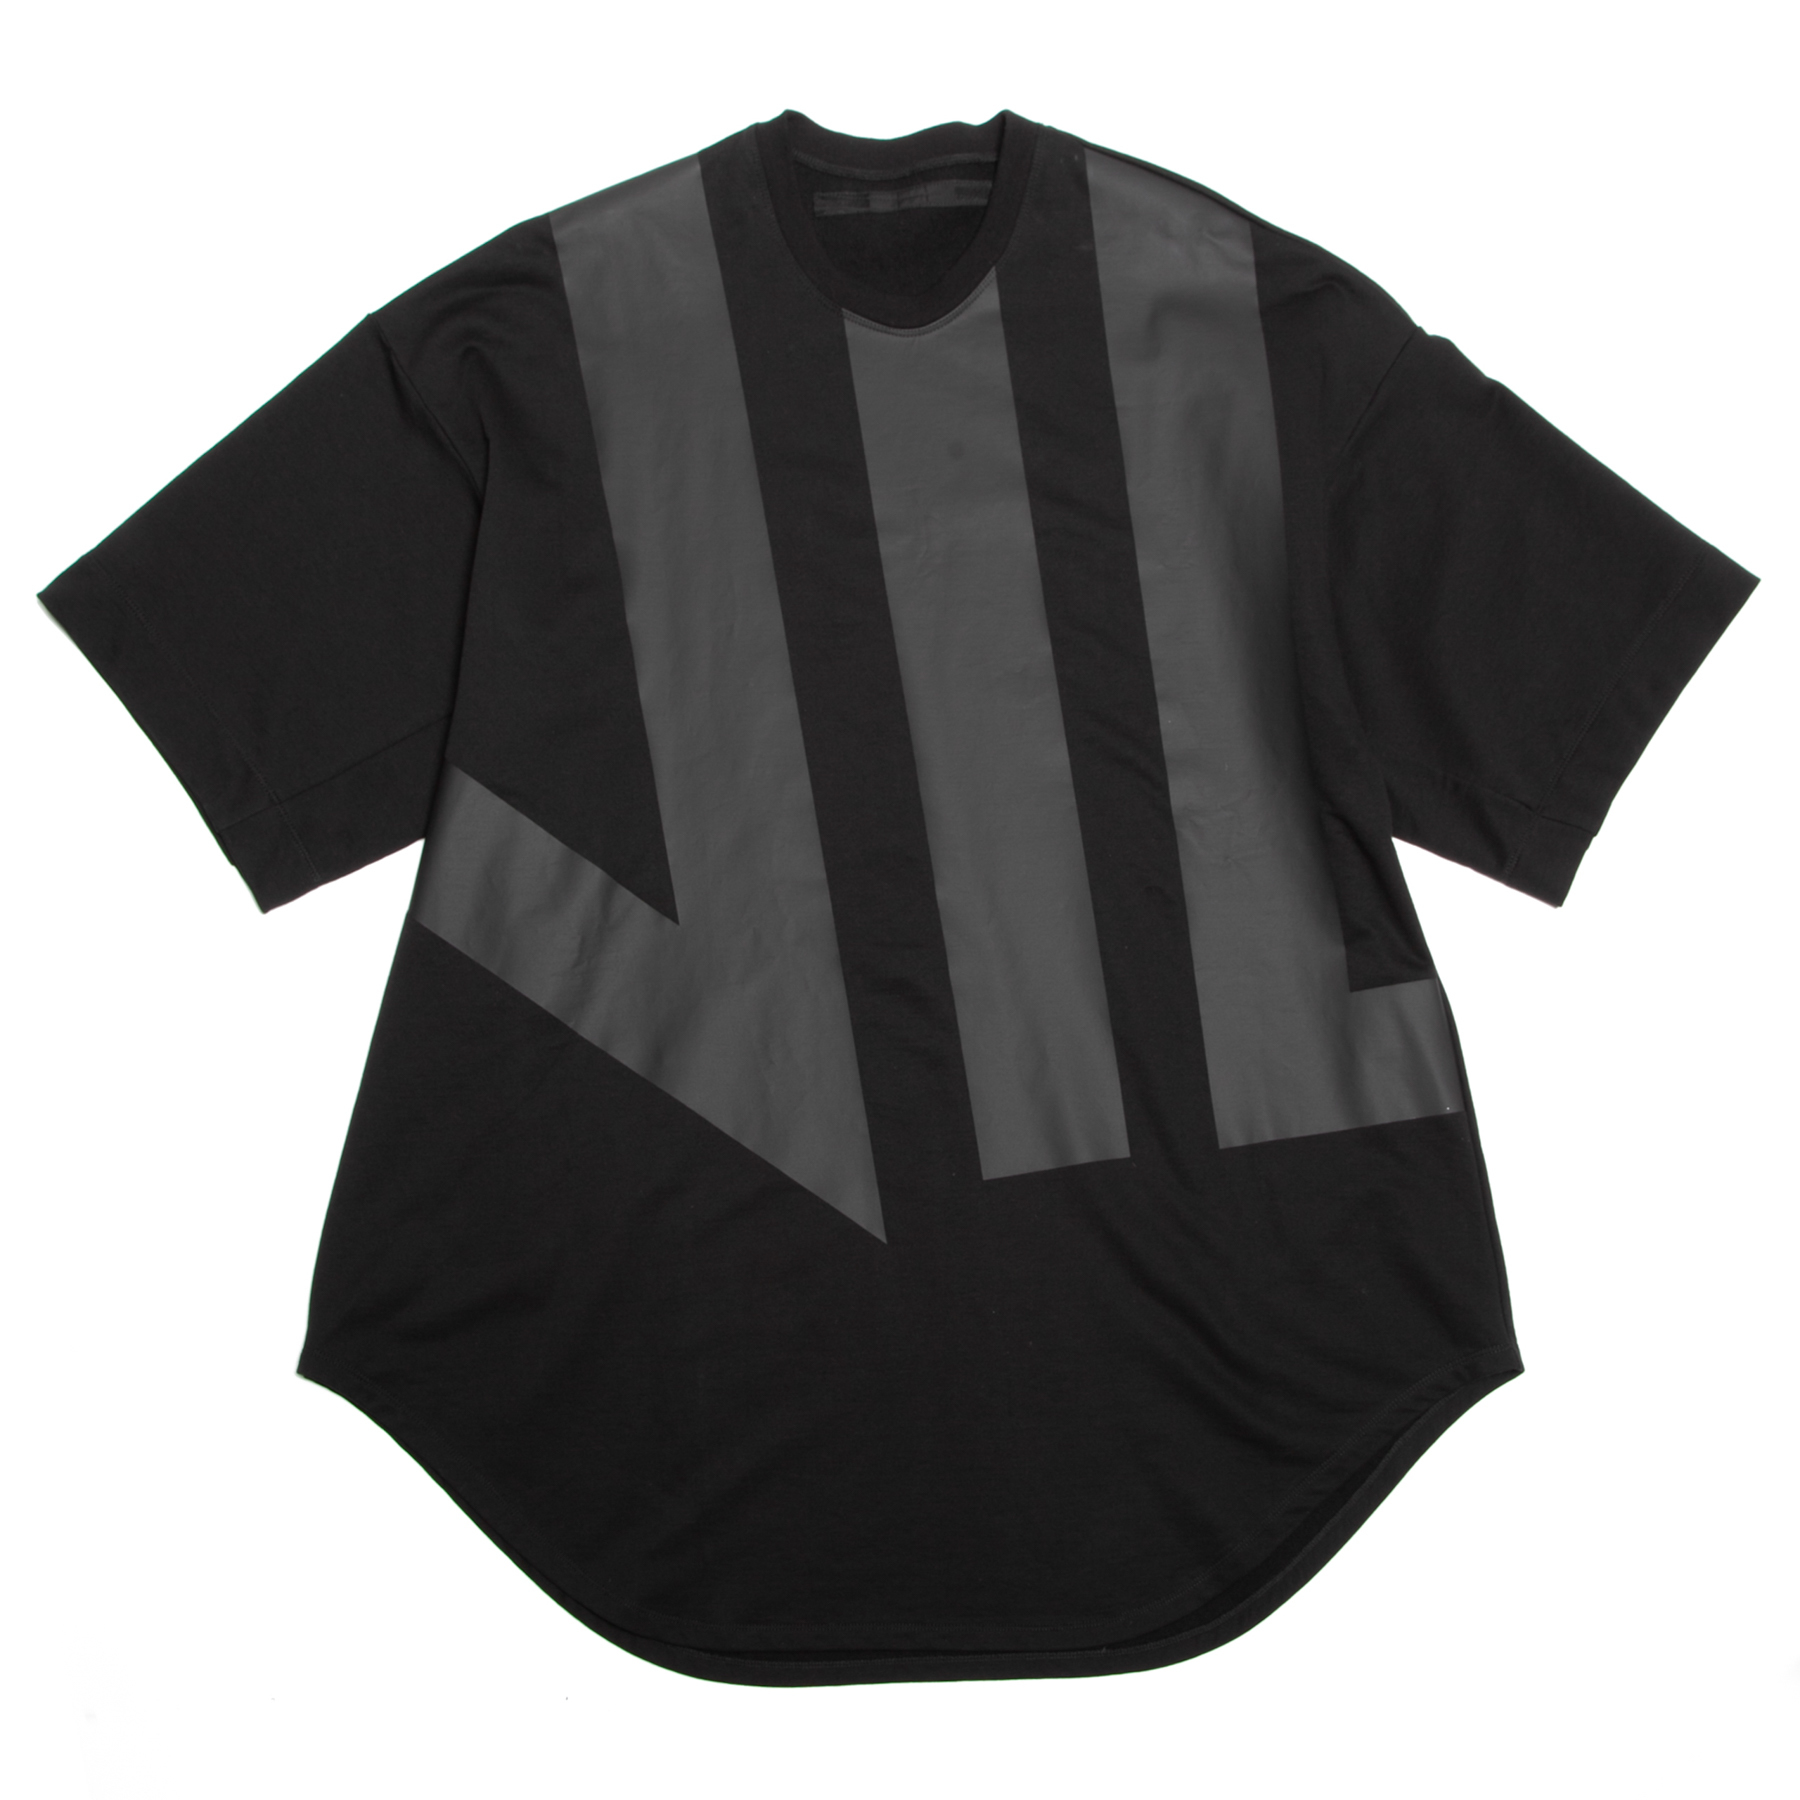 640CPM6-BLACK / 家紋ラウンドスウェットTシャツ